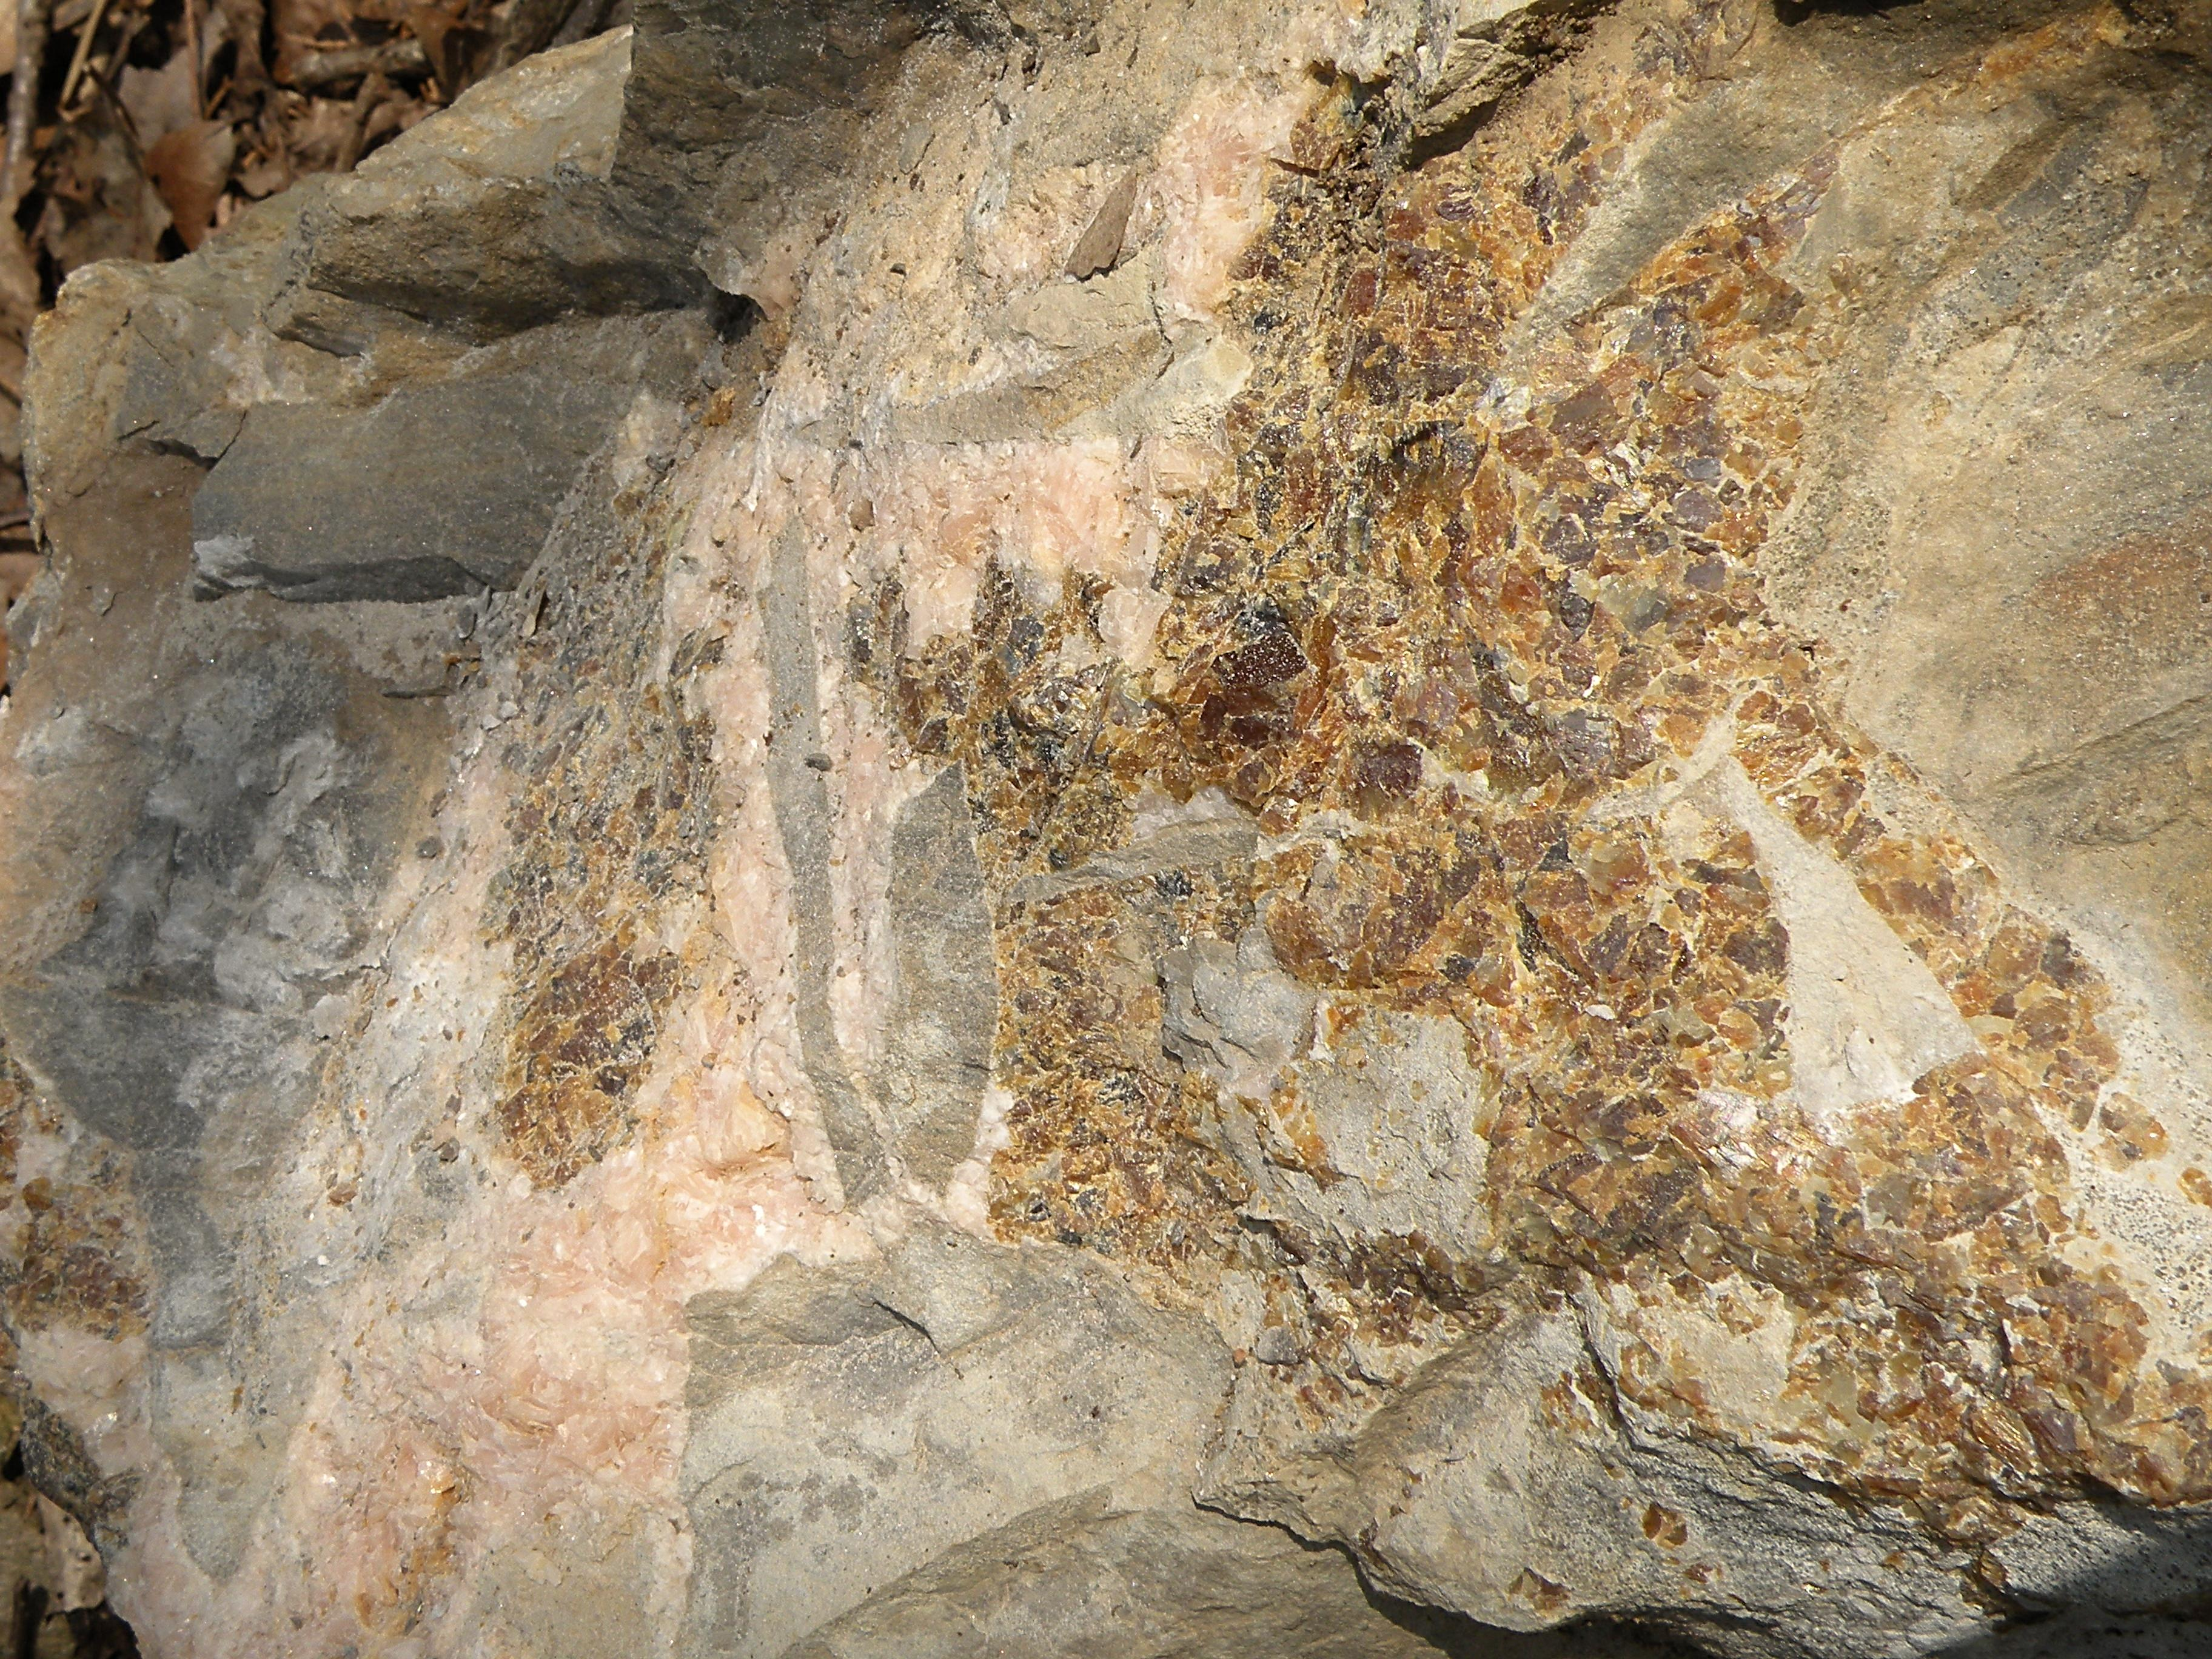 Fossiliferous Dolostone